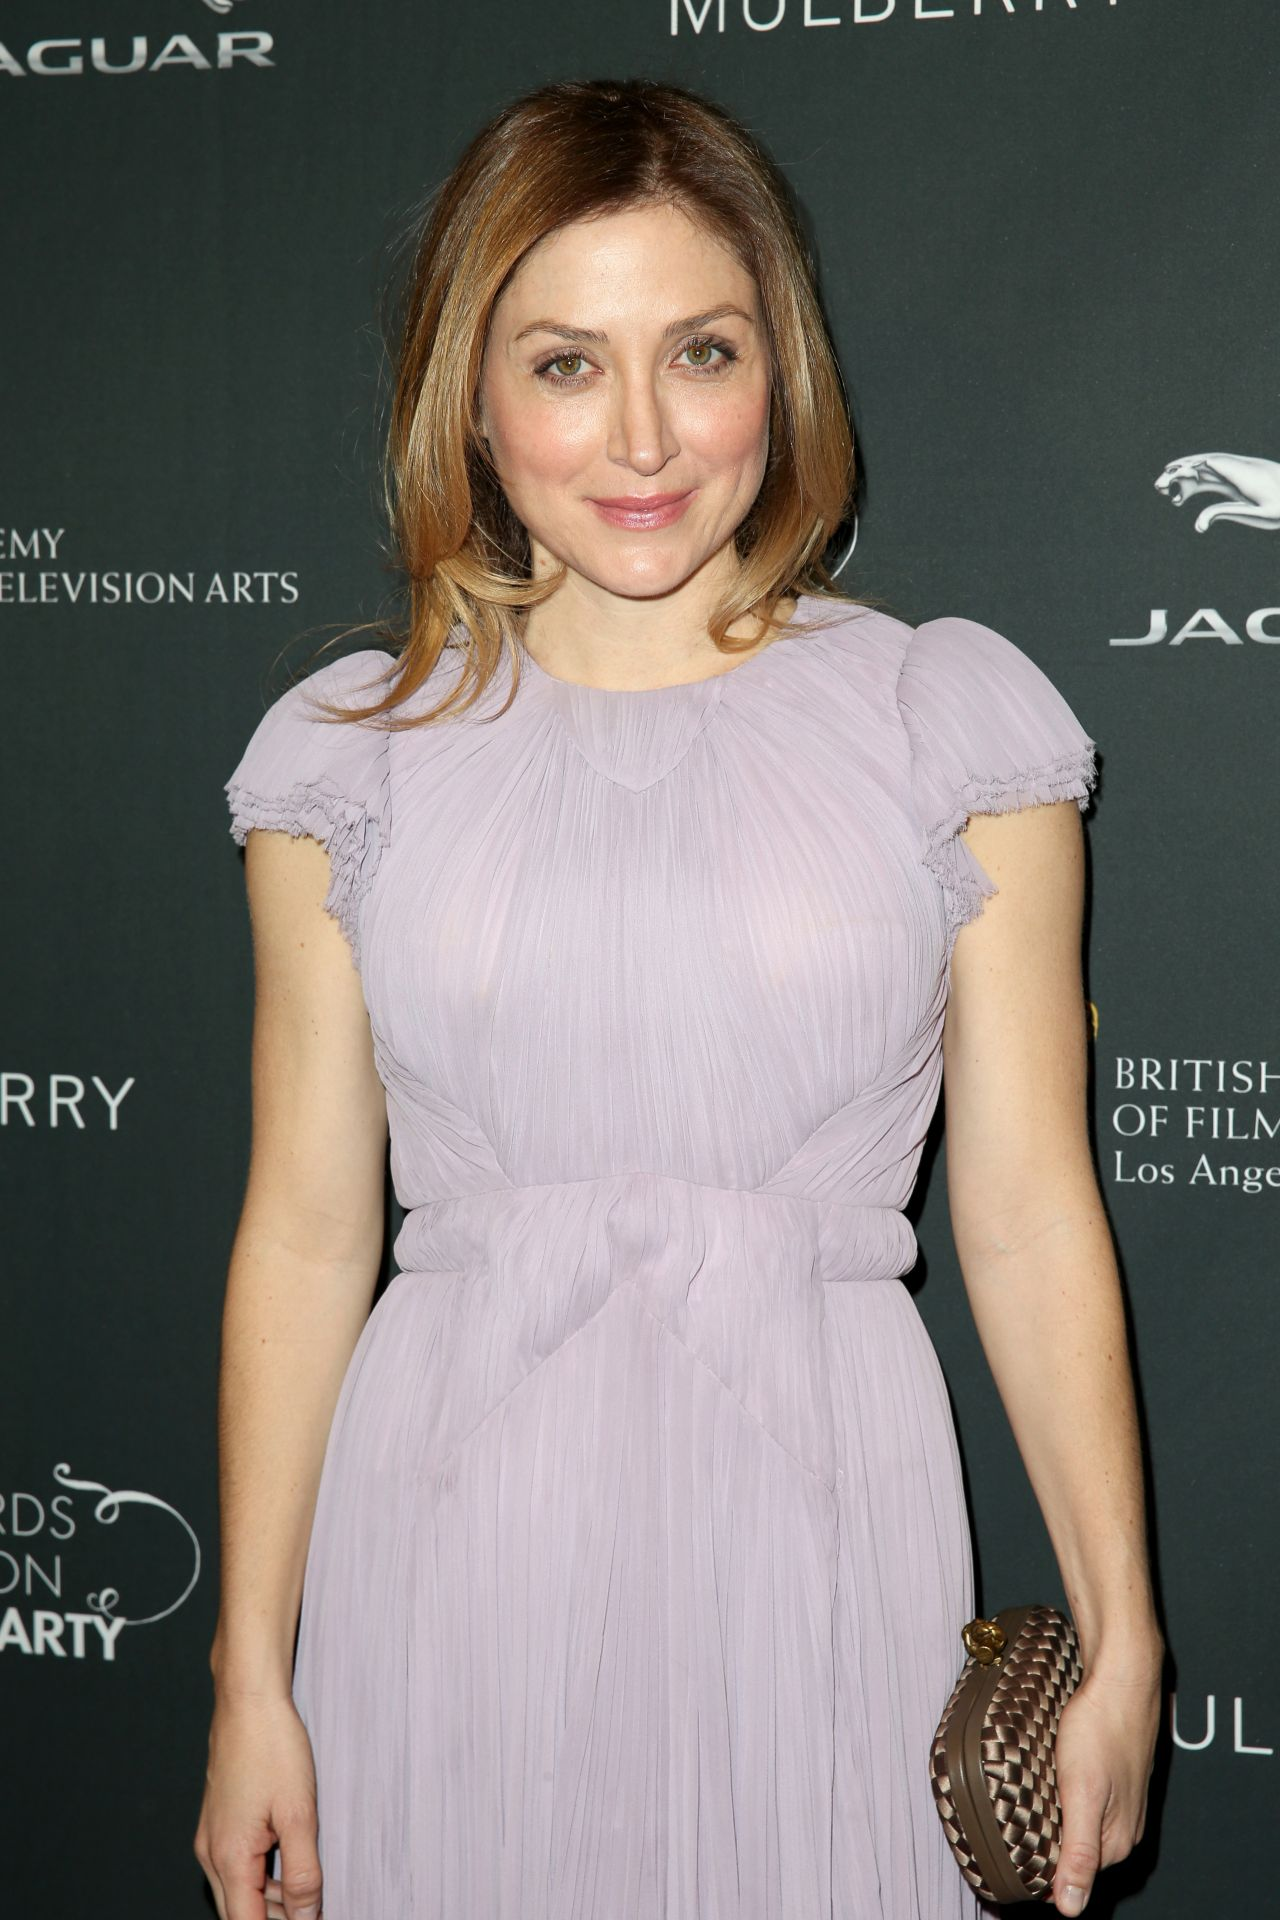 Sasha Alexander at BAFTA LA 2014 Awards Season Tea Party